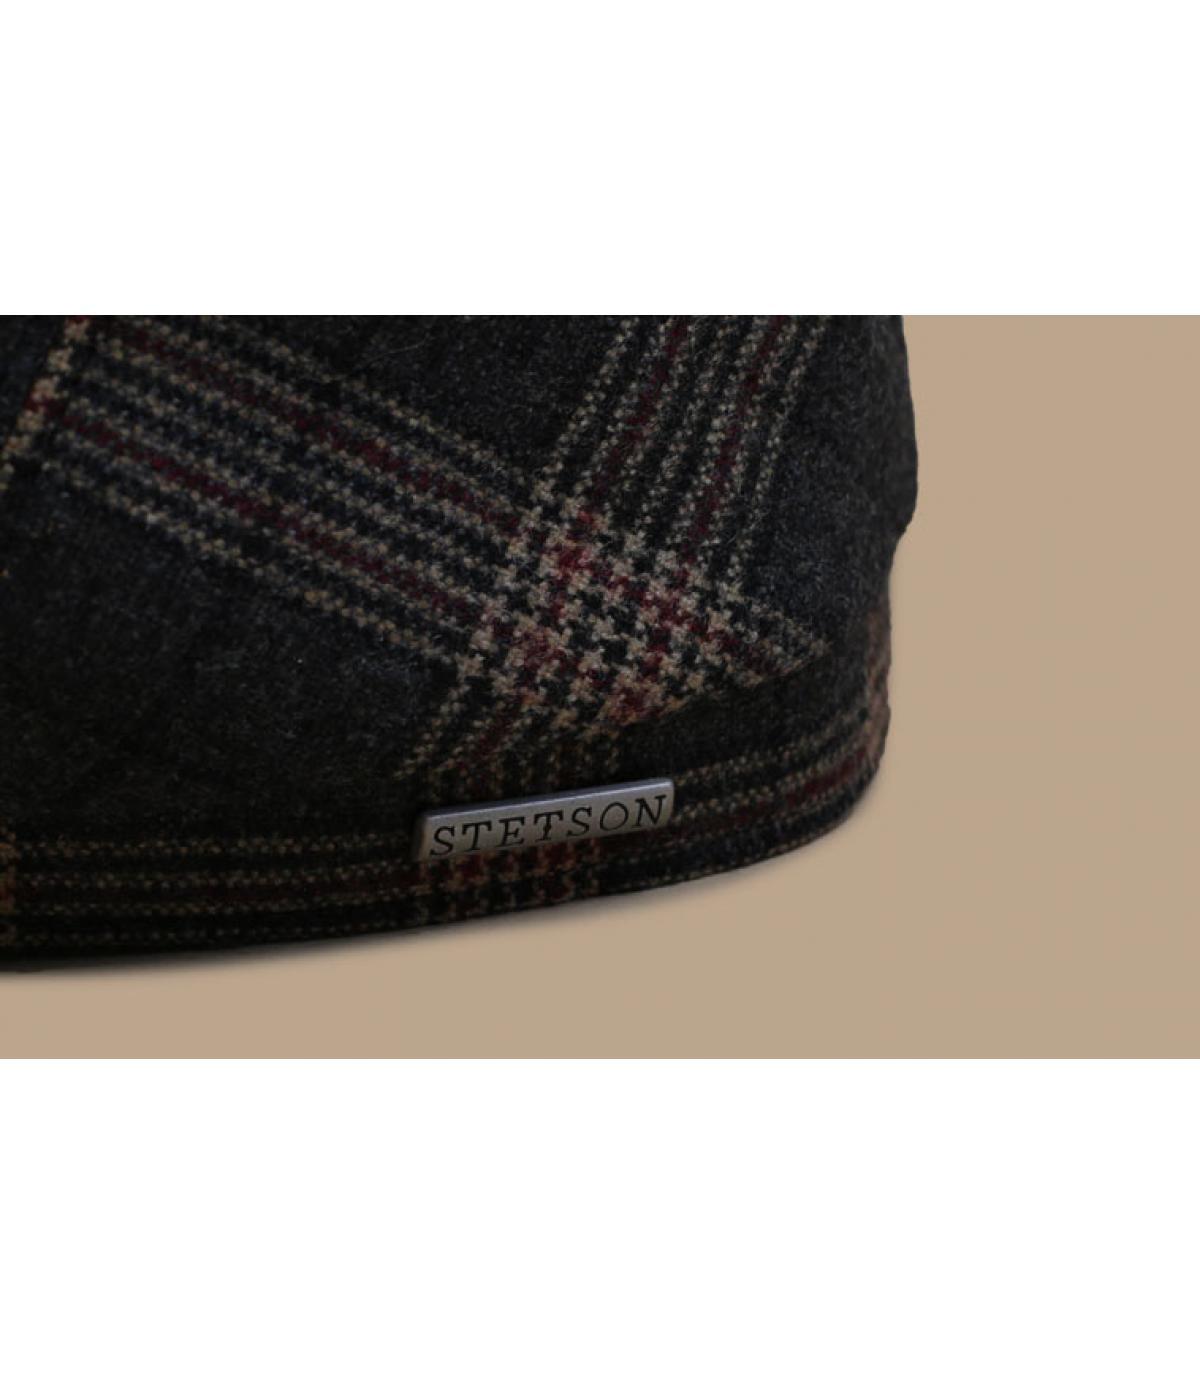 Détails 6-Panel Cap Wool Check grey brown - image 3